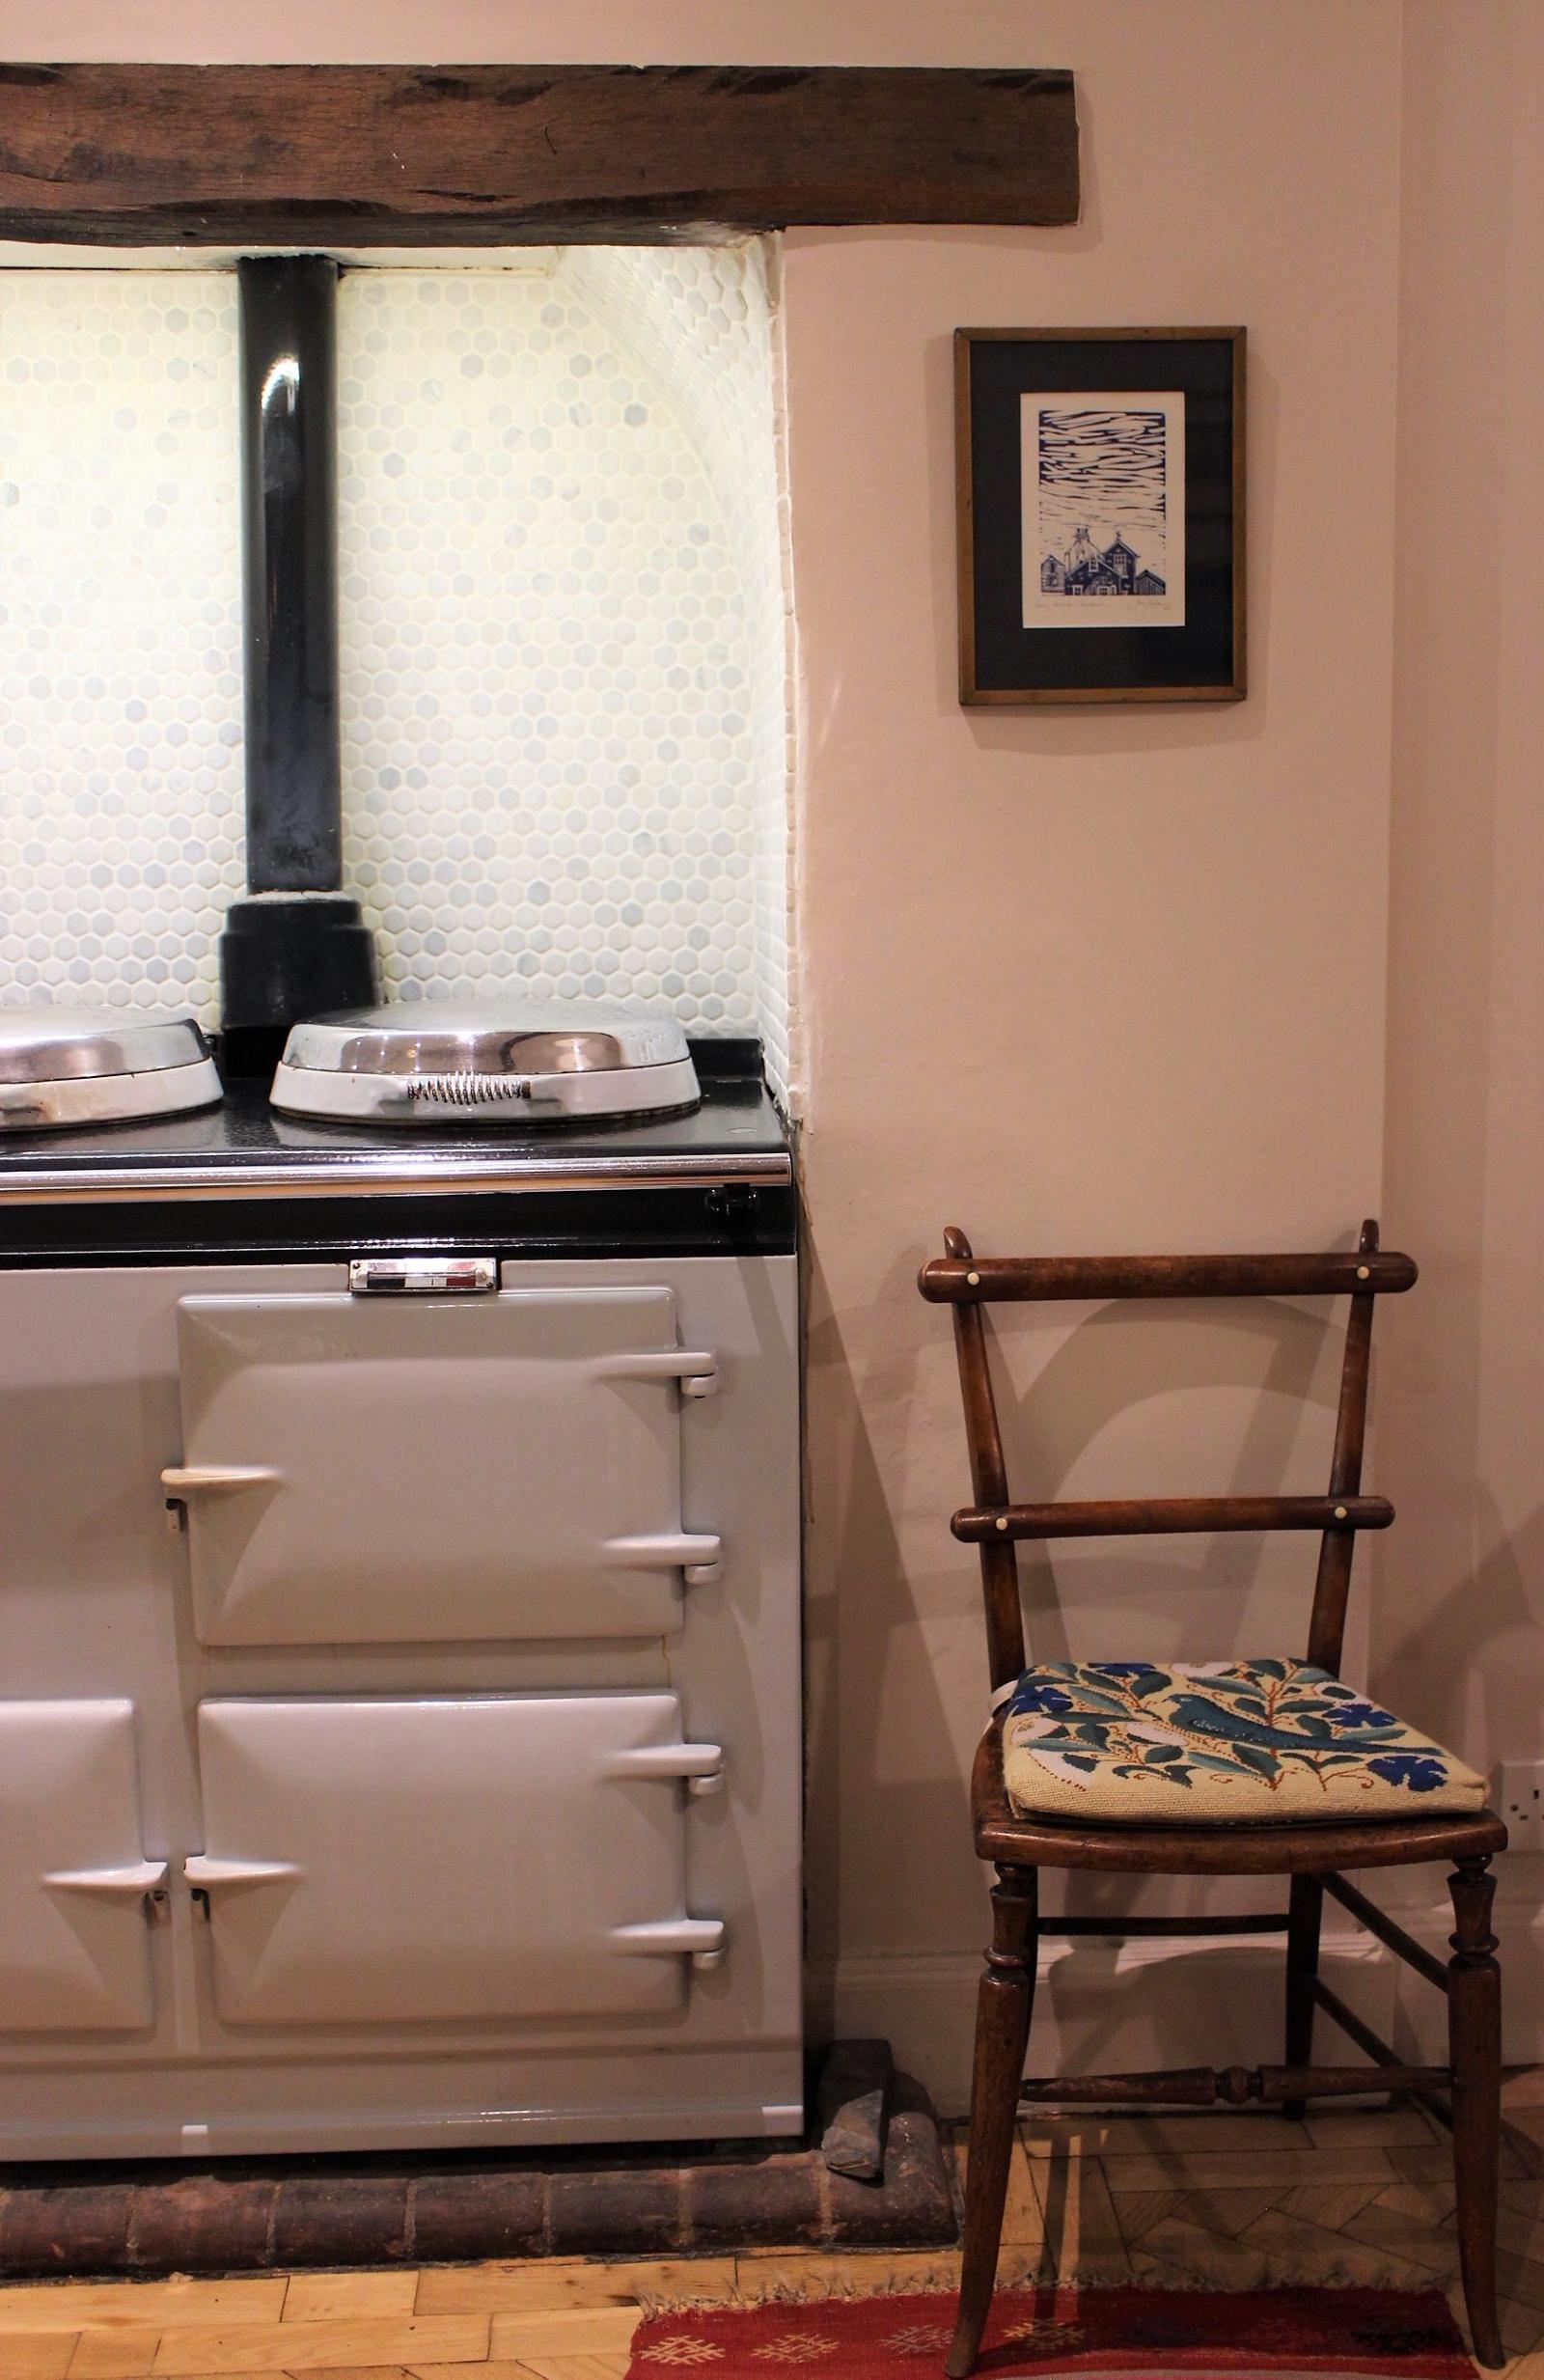 Kitchen Design Inspiration - our lovely aga